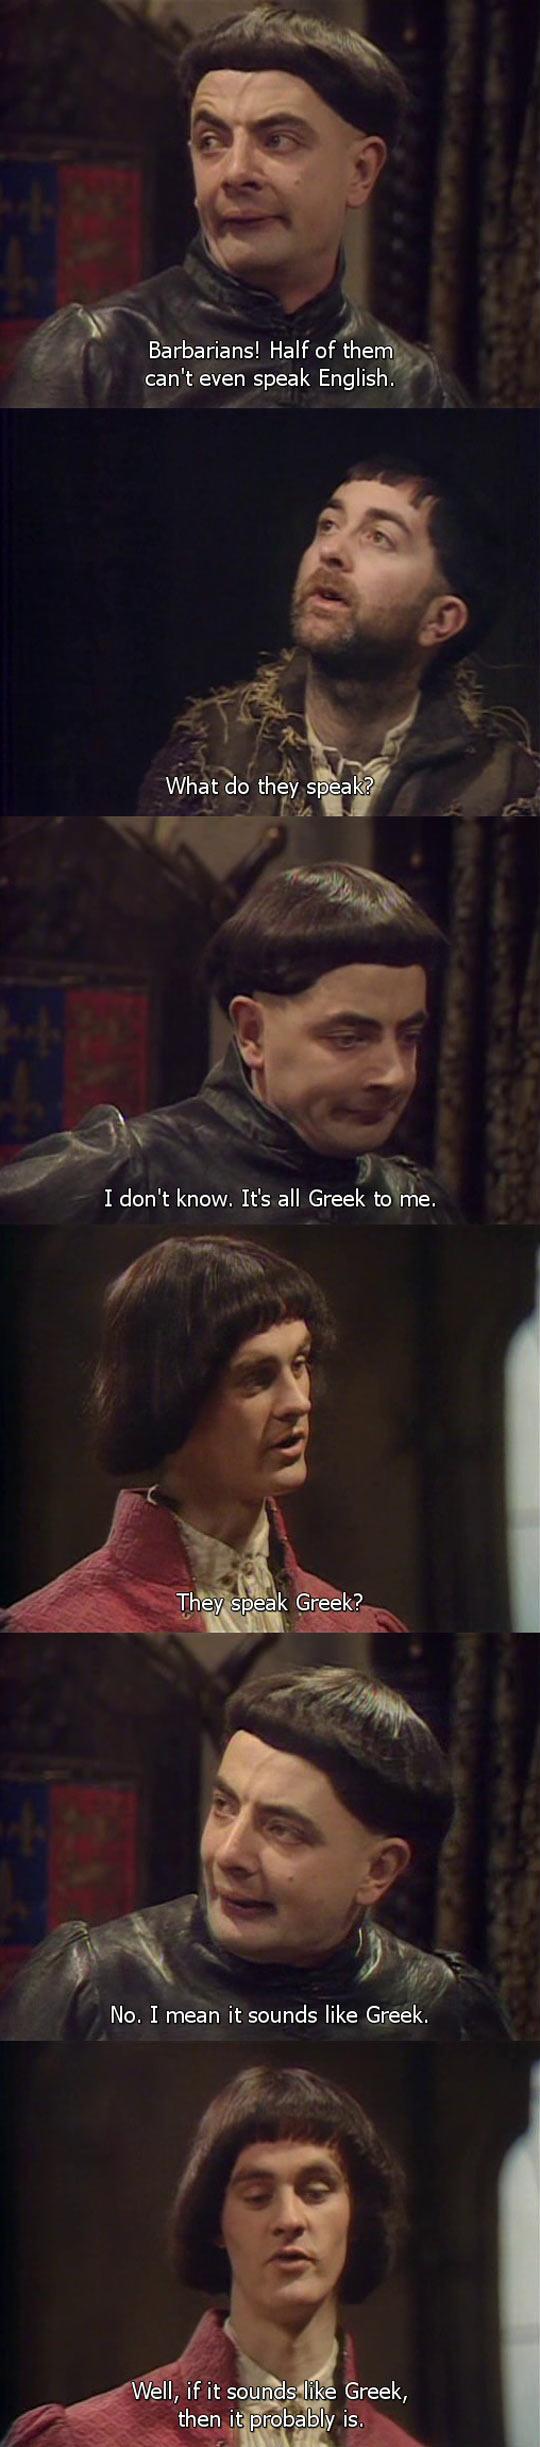 funny-Rowan-Atkinson-Barbarians-speaking